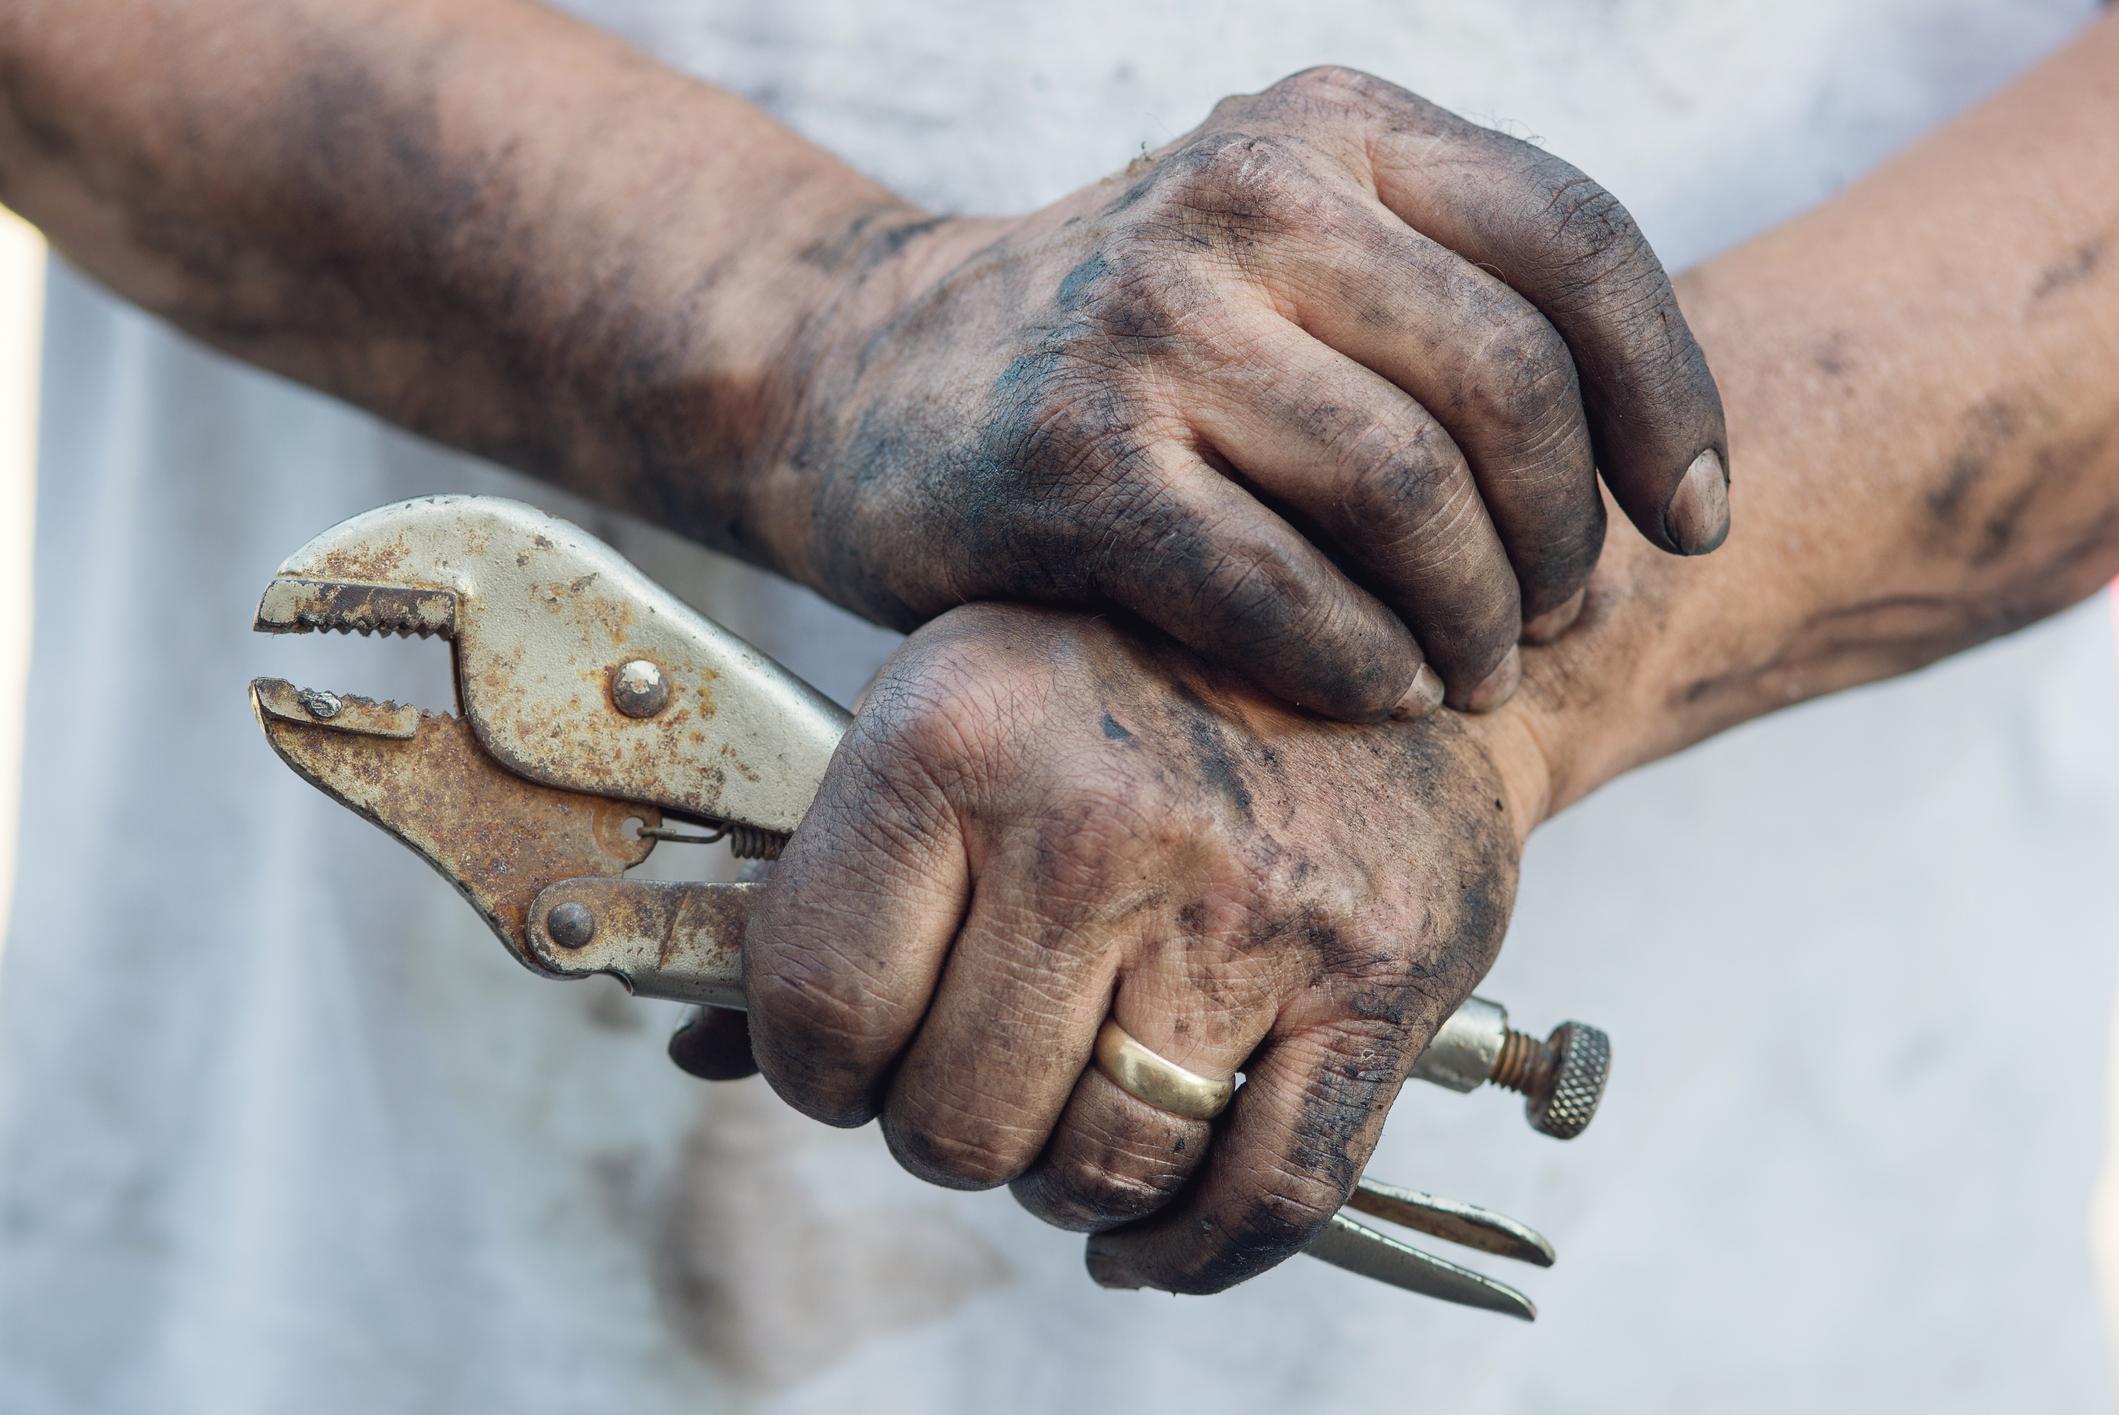 salissures mains garagiste (istock - pay